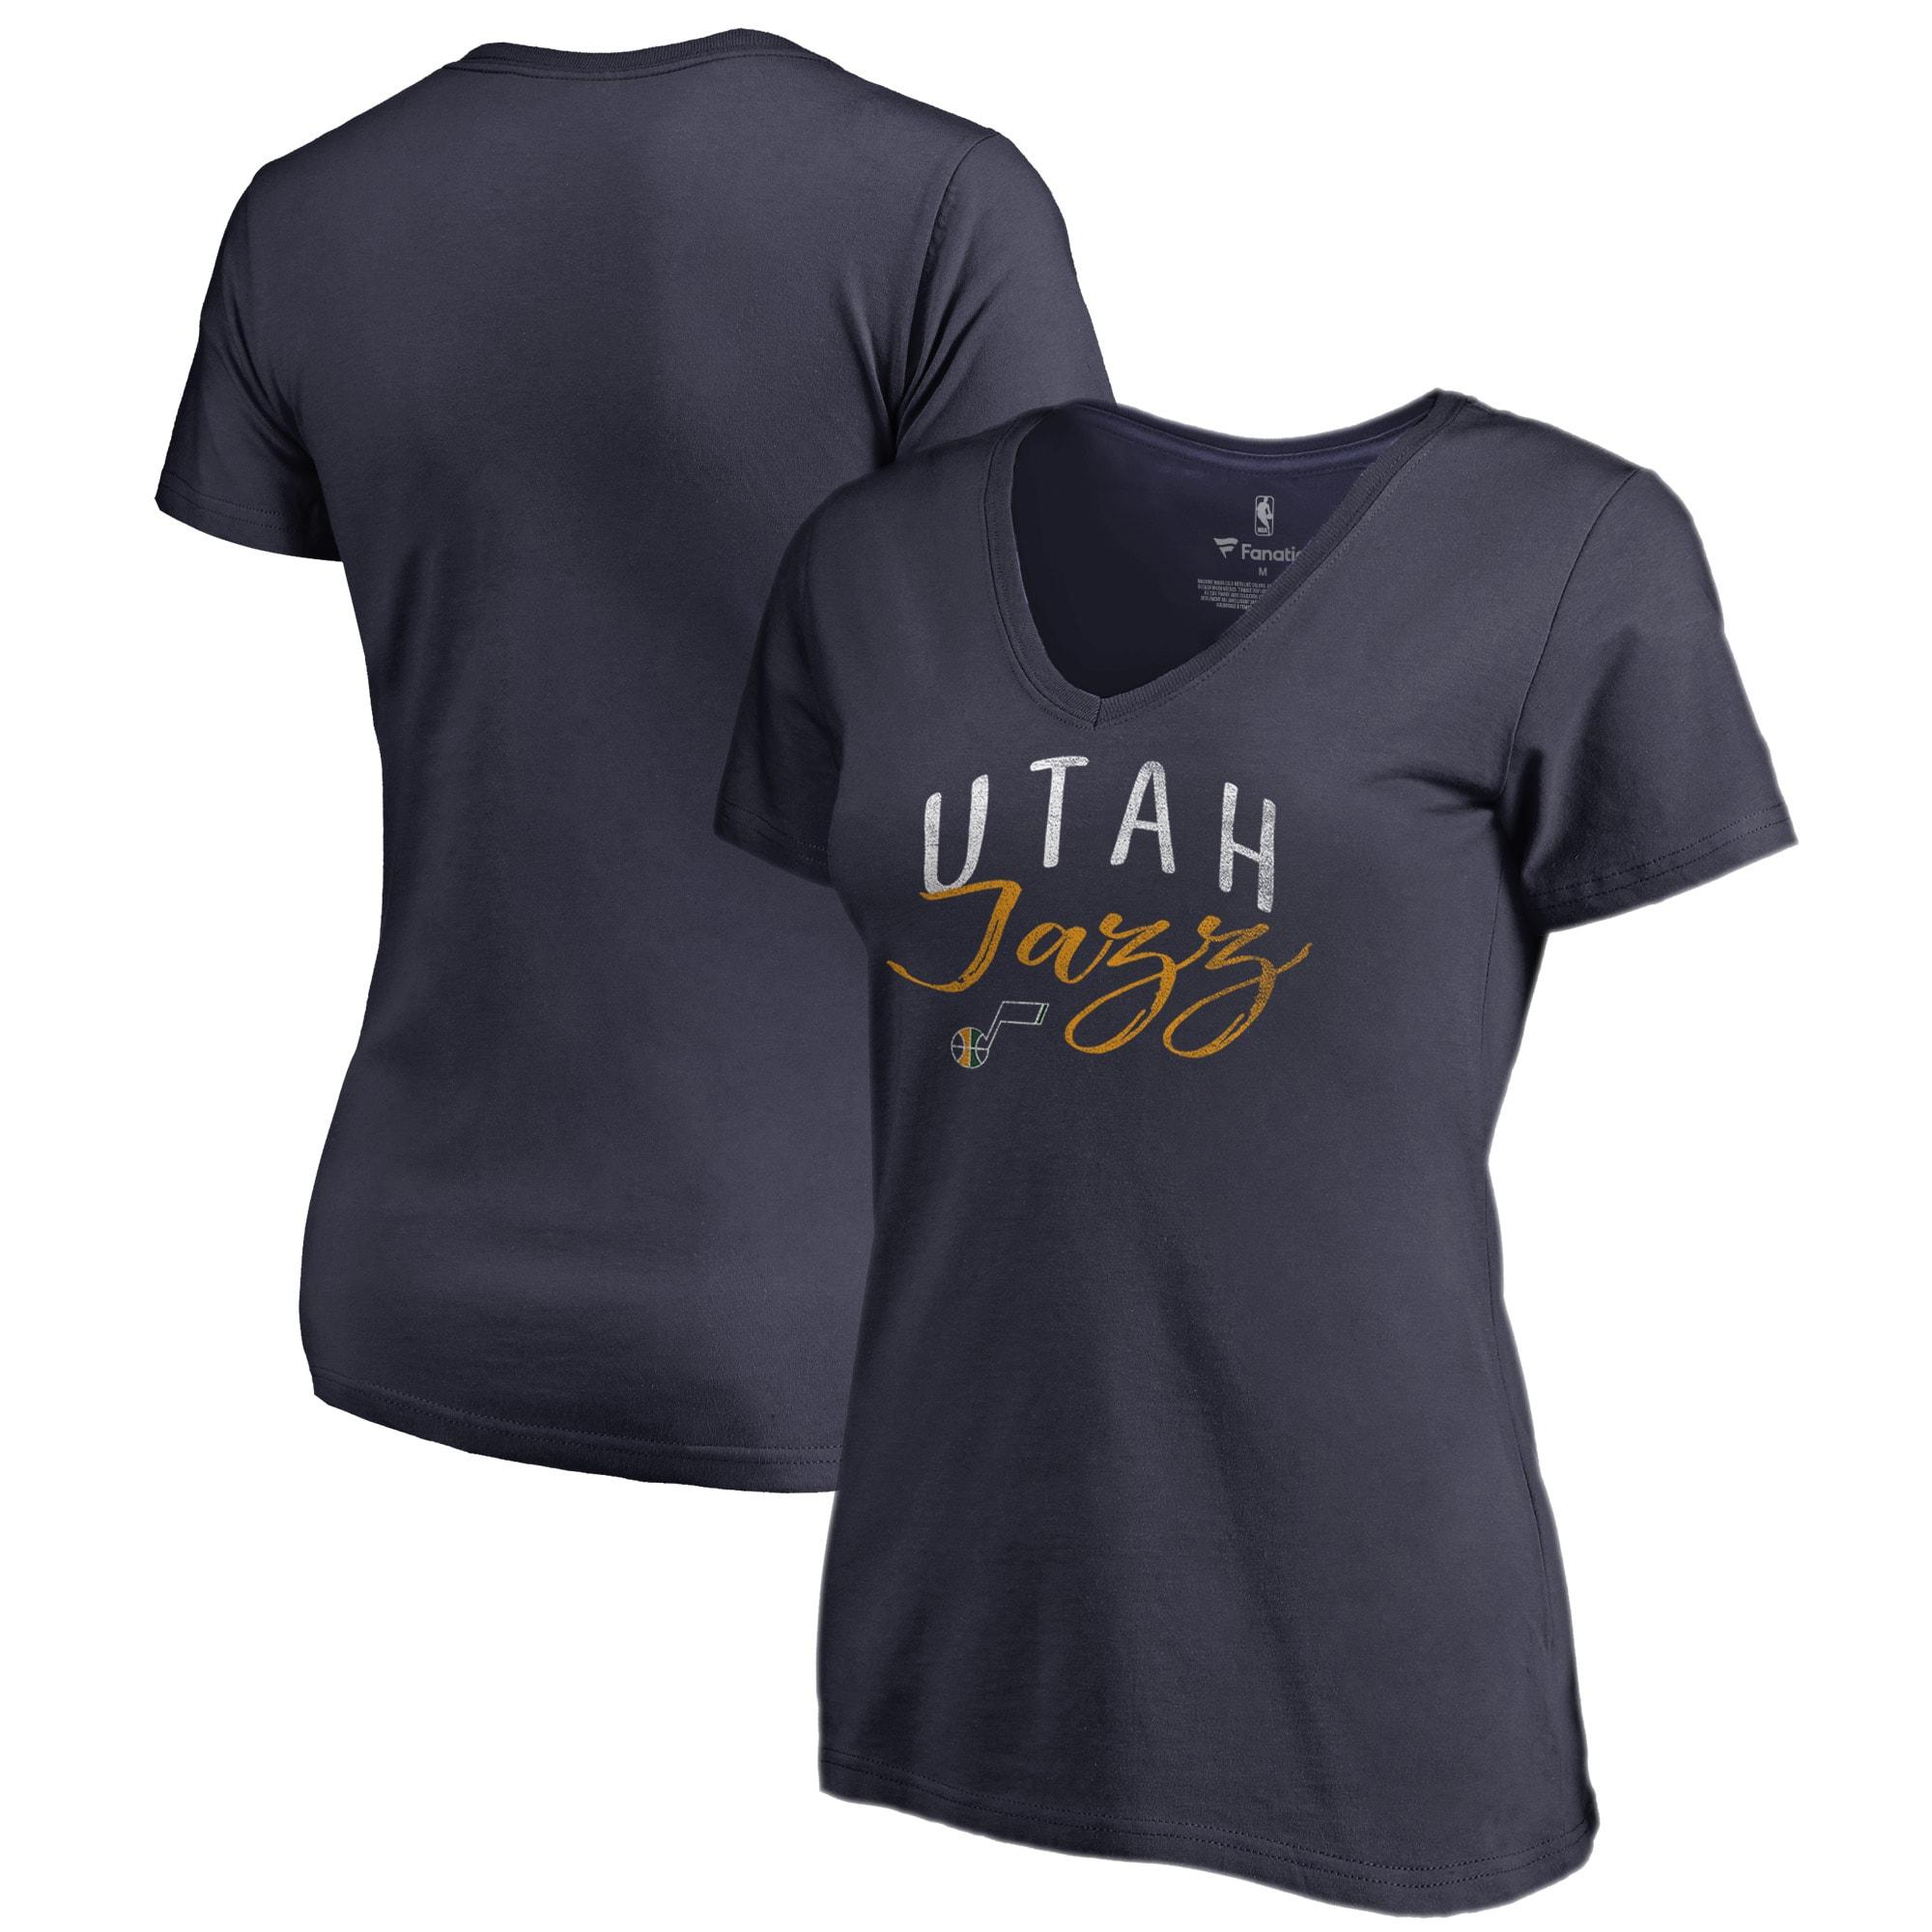 Utah Jazz Fanatics Branded Women's Graceful V-Neck Plus Size T-Shirt - Navy